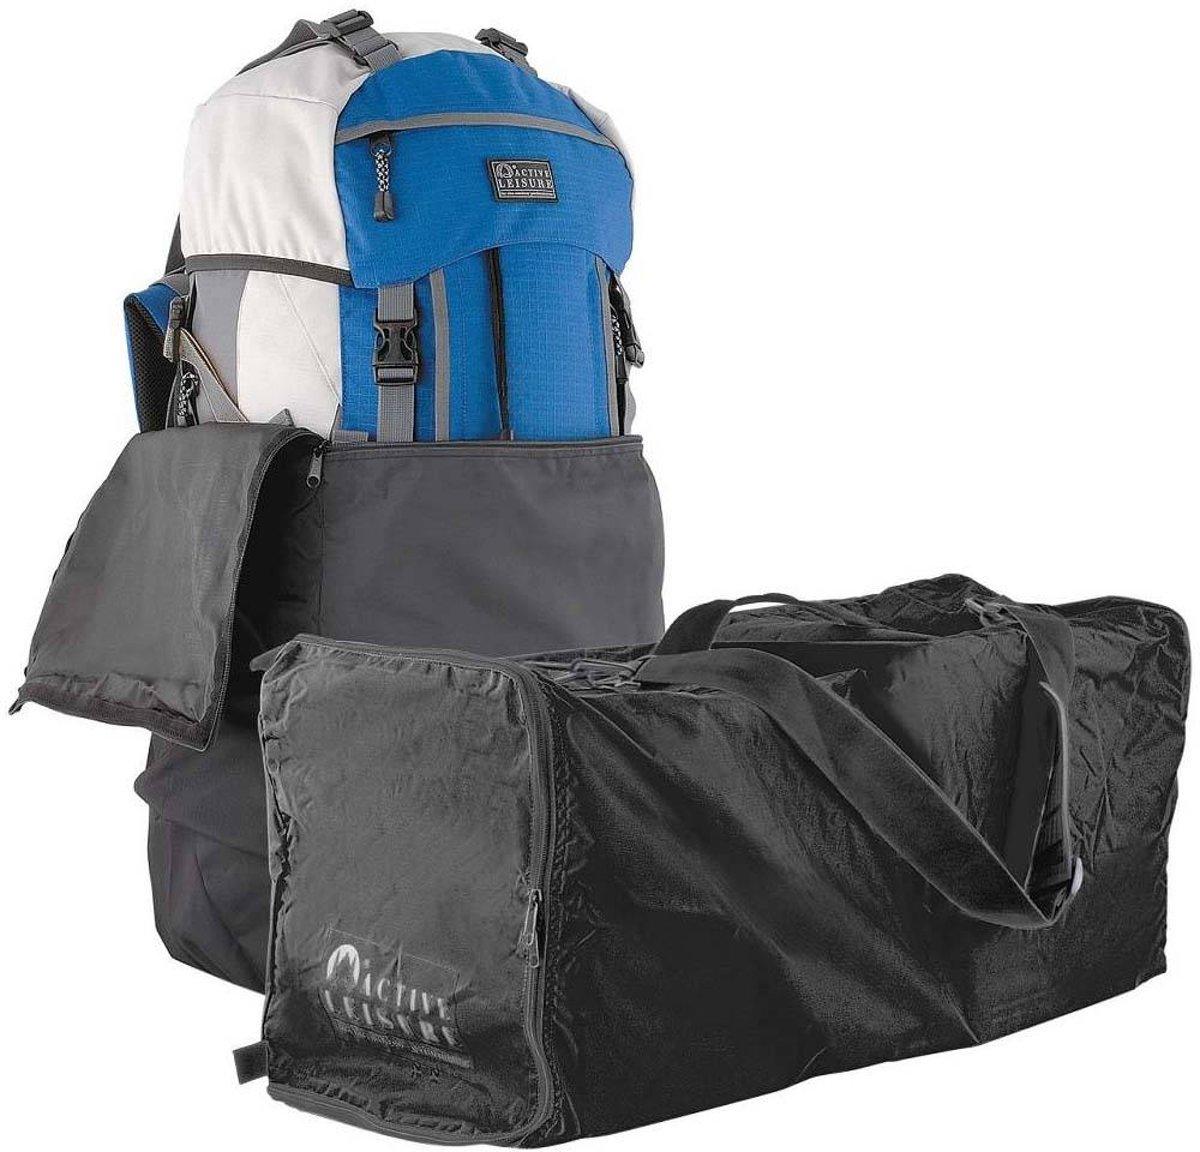 9a91c4ed967 bol.com   Flightbag kopen? Alle Flightbags online